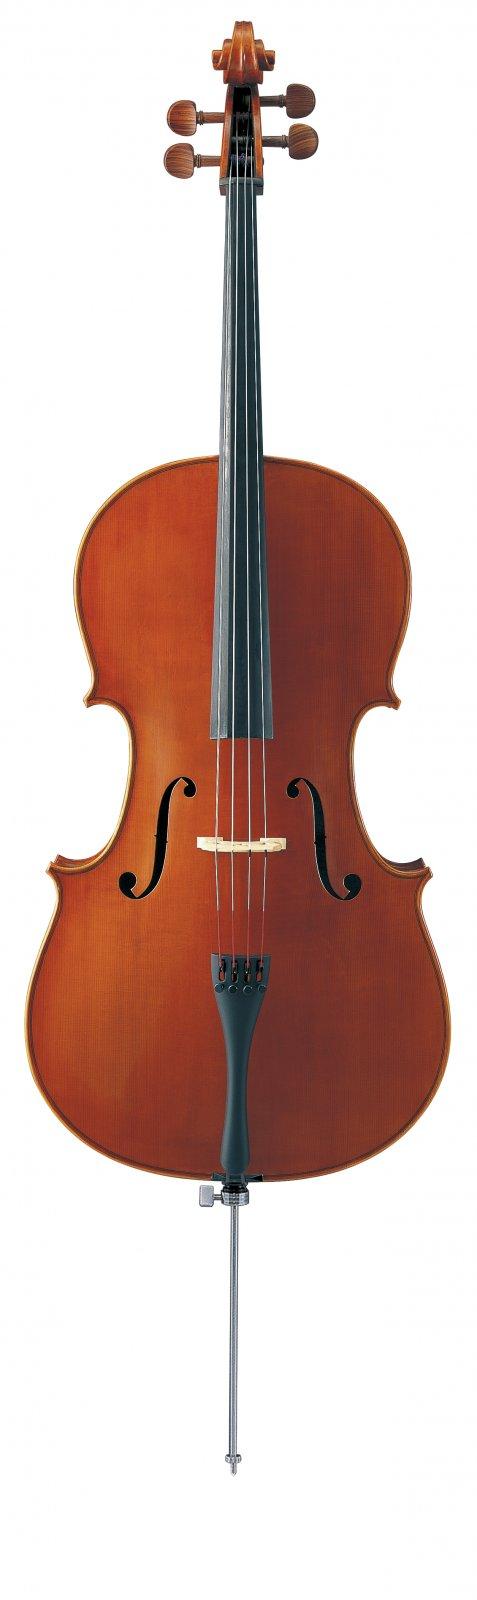 Yamaha Braviol Cello 1/4 AVC5-14S